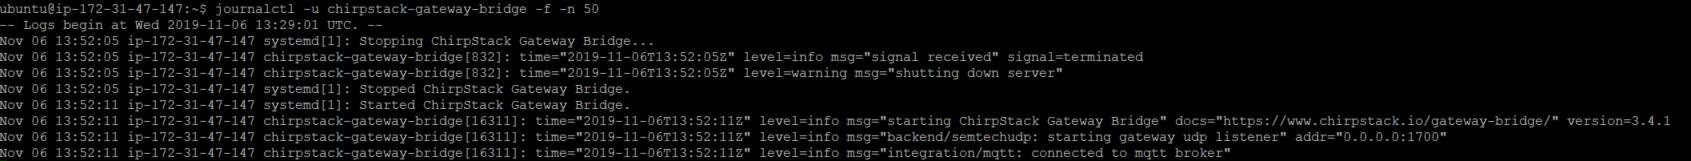 Gateway Bridge Journal Control output (no errors).png